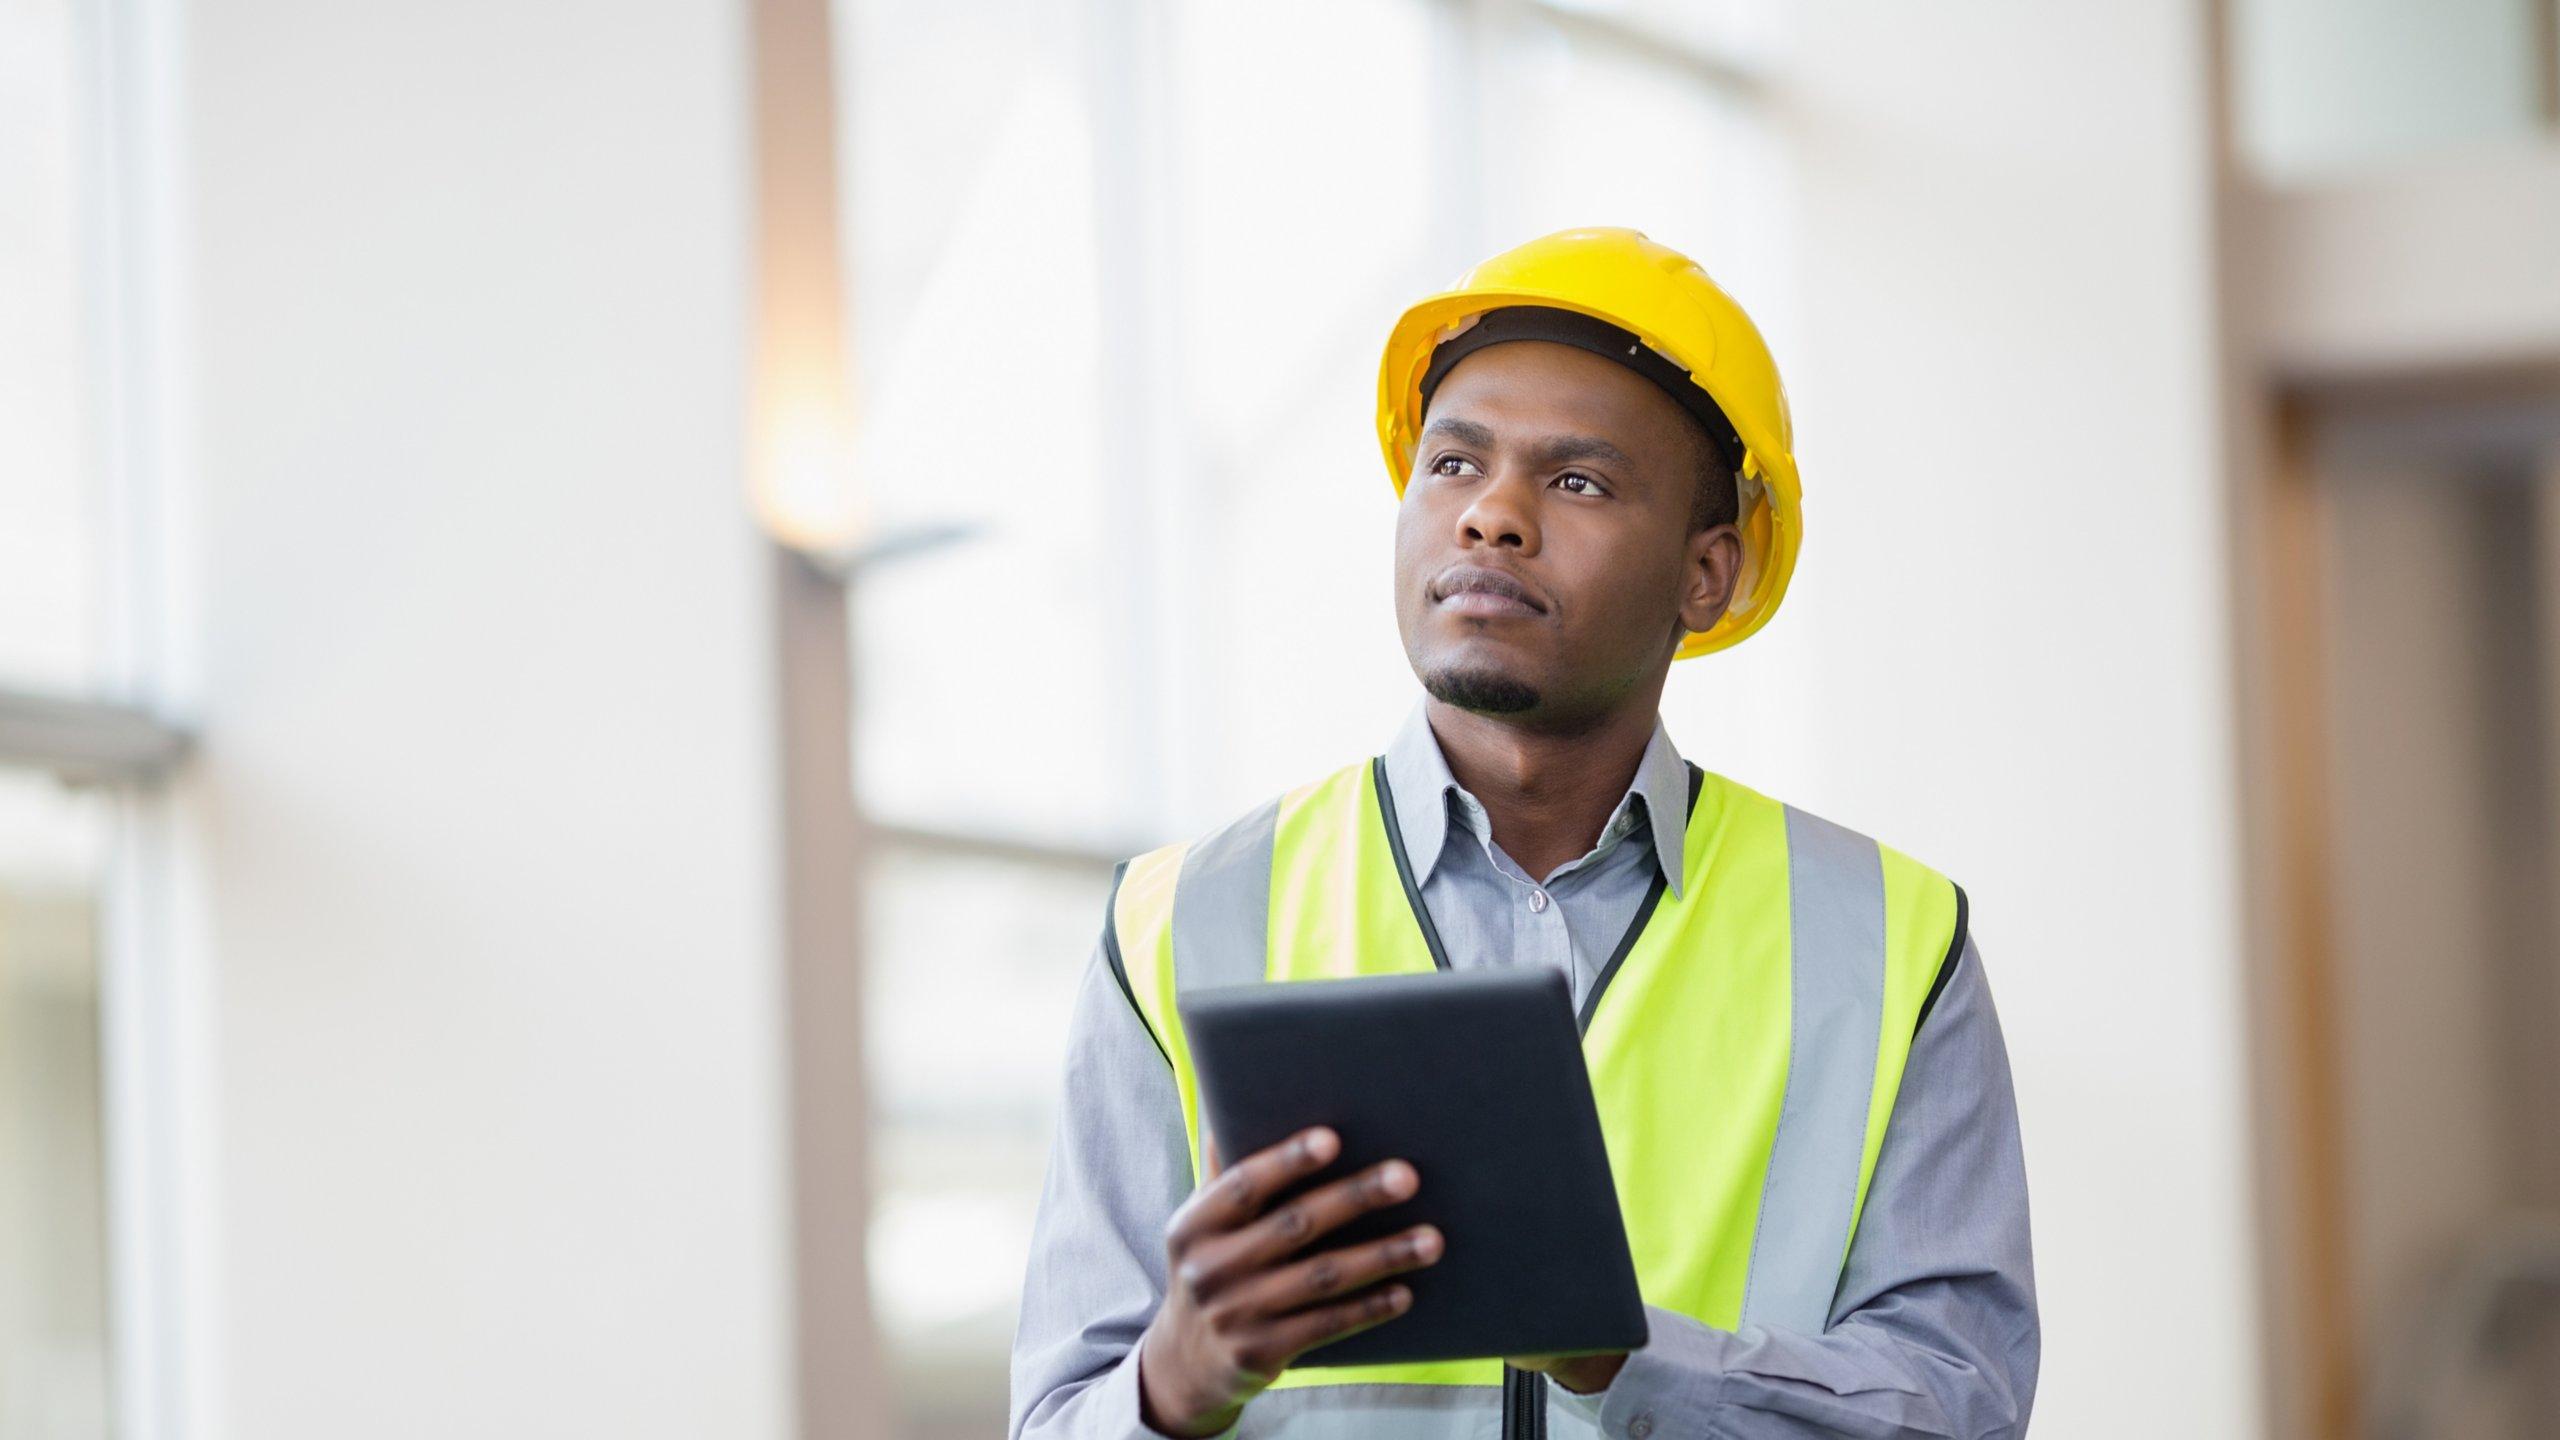 Maintenance engineer wearing yellow hard hat checking preventive maintenance data outside factory.